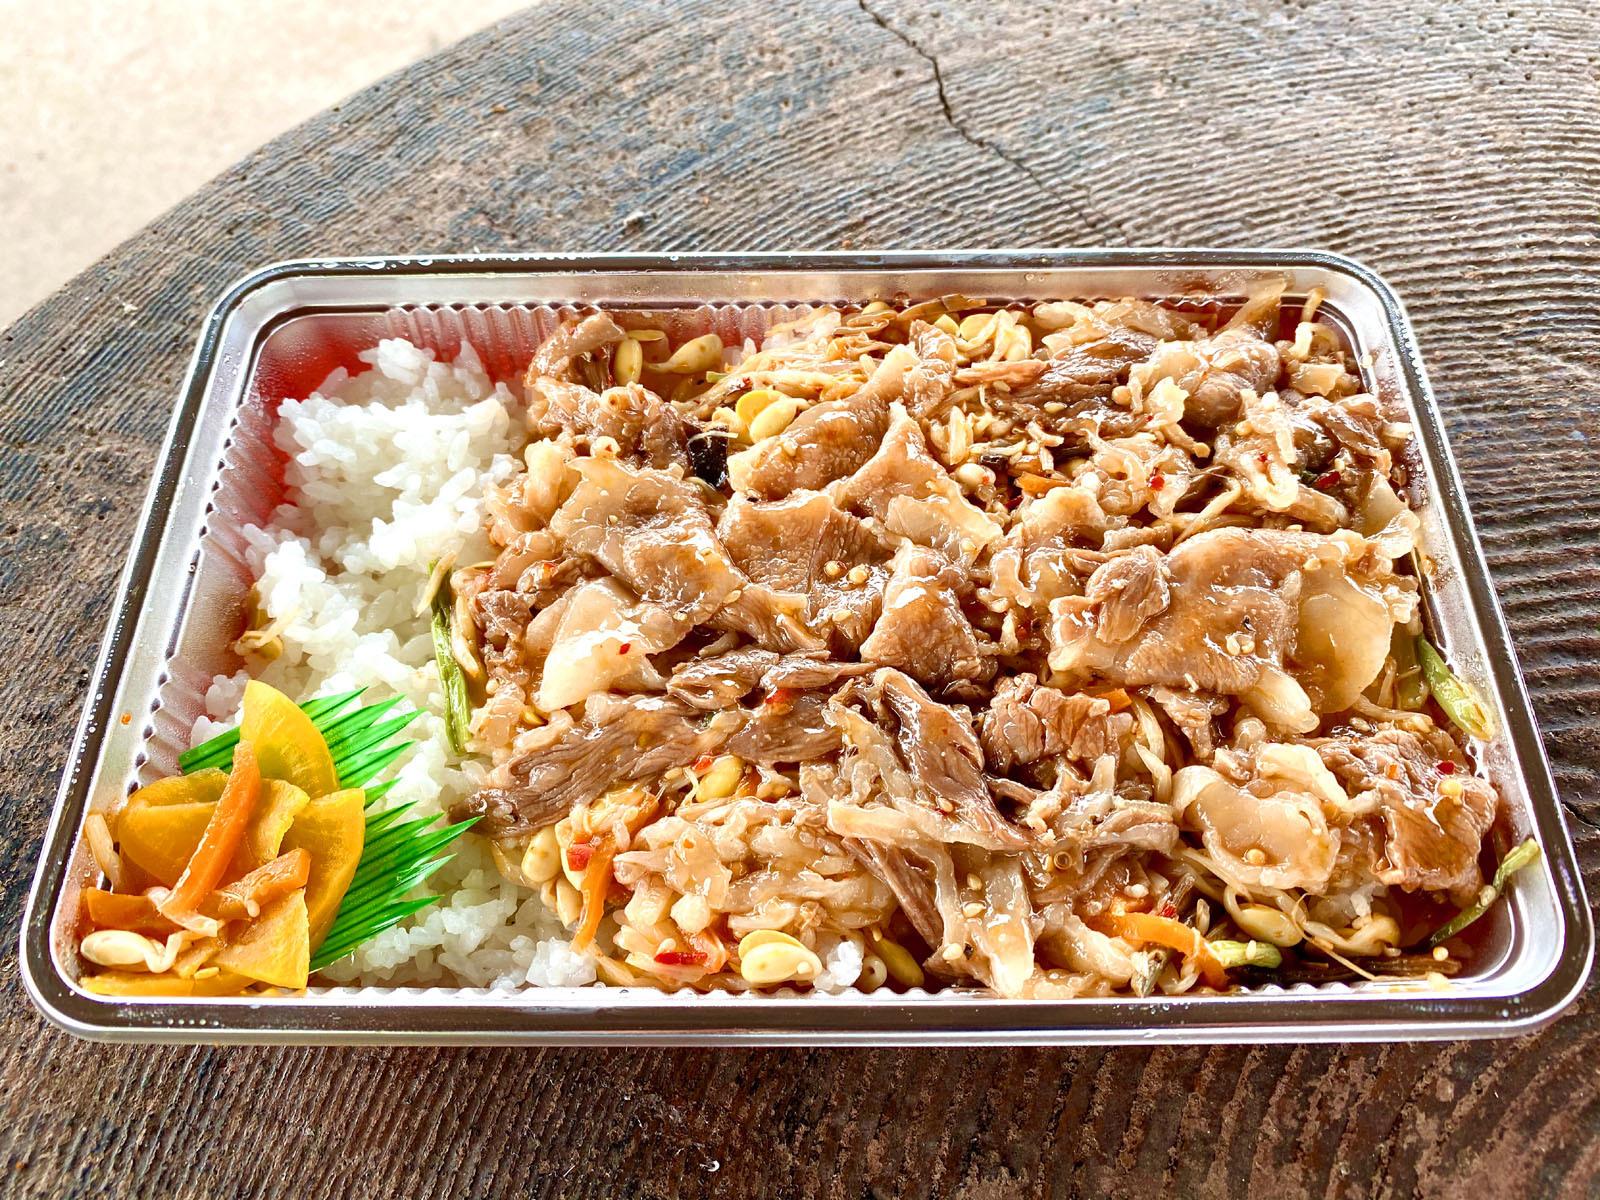 大渚亭 オリーブ牛焼肉弁当 900円